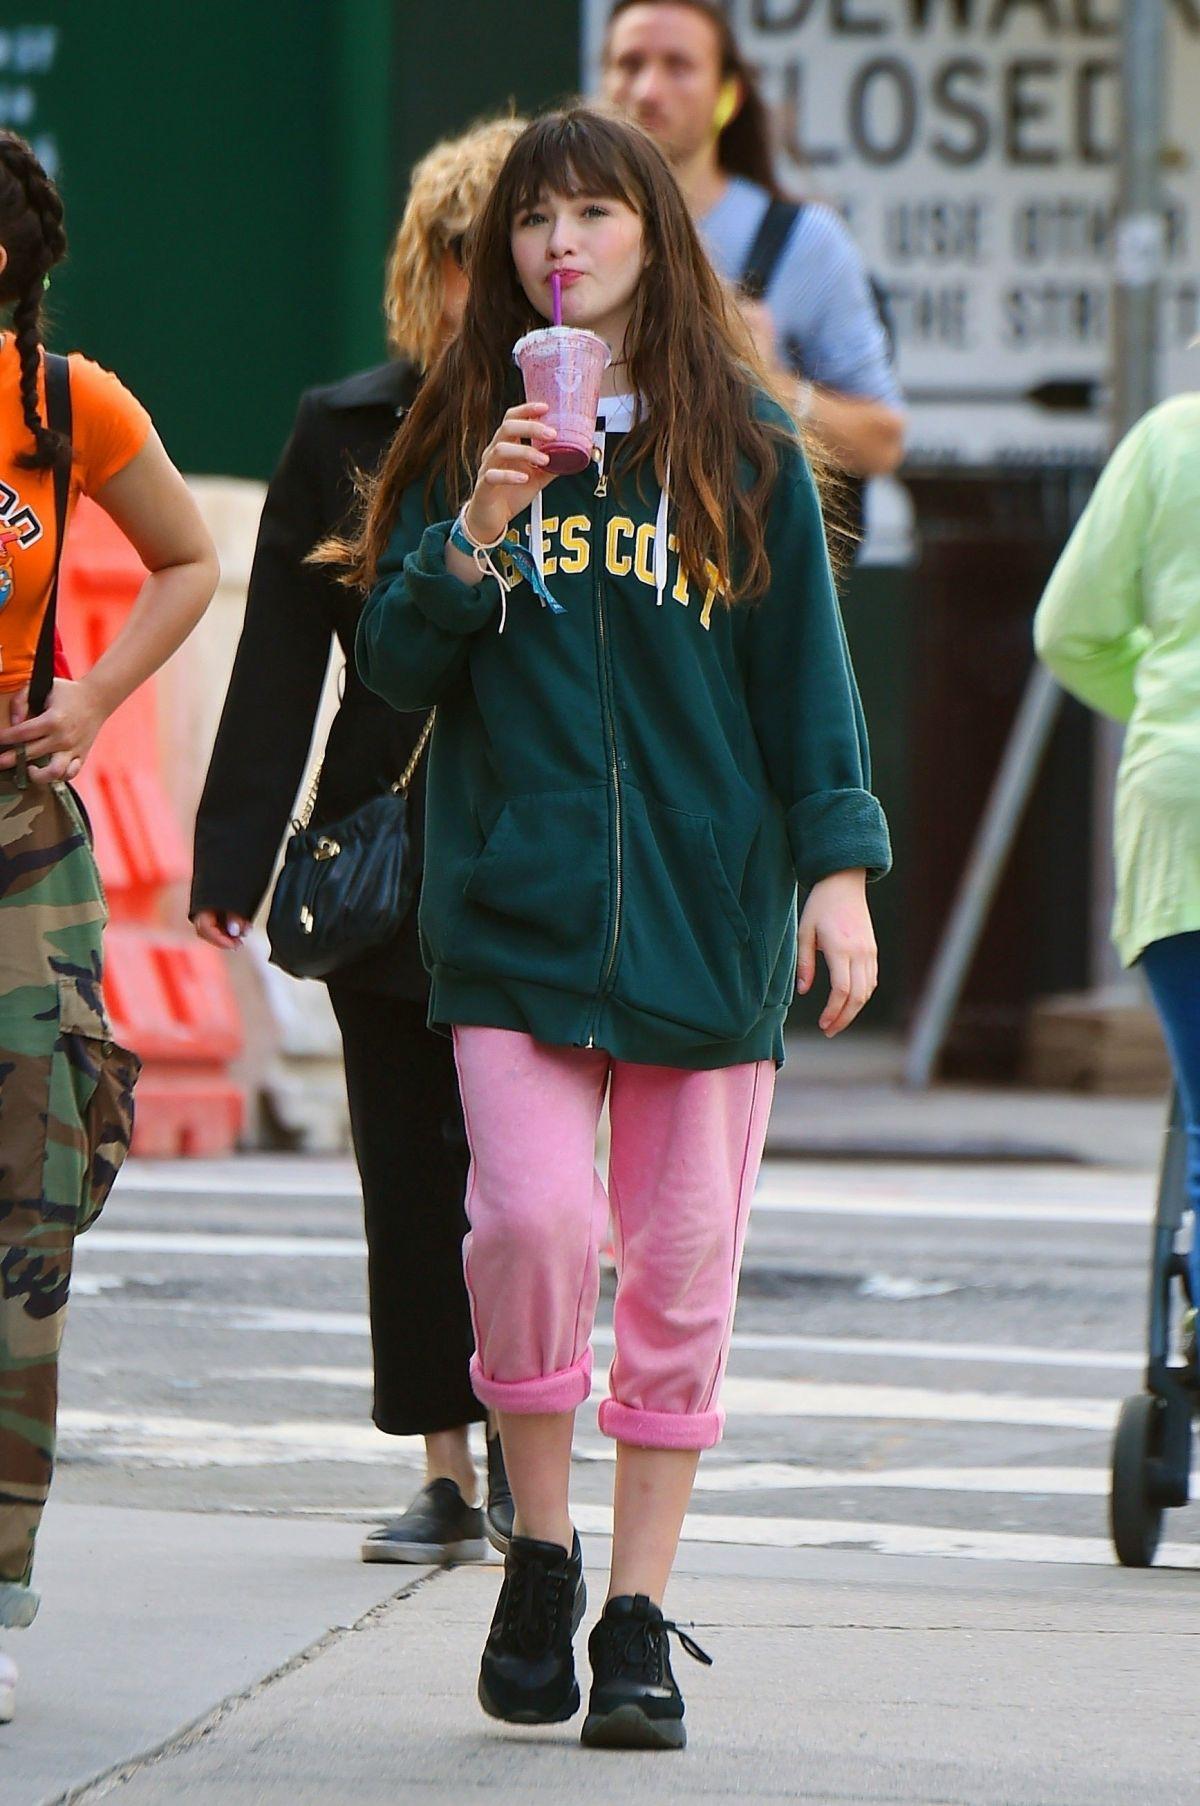 Morgan Brittany,Jenna Elfman Adult pics & movies Monika Lee,Deborah Twiss